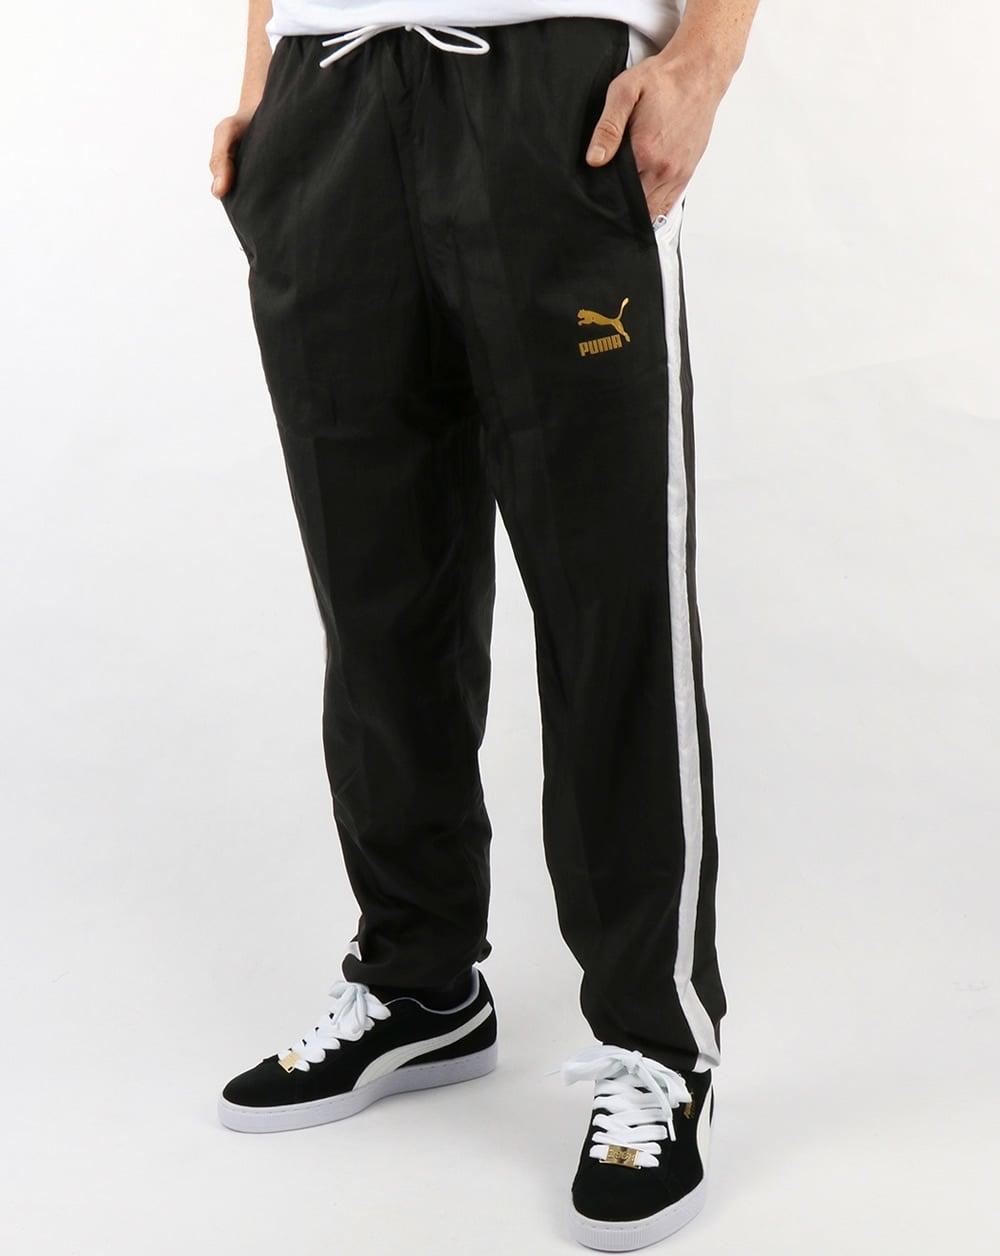 Puma T7 Bboy Track Pants Black White 80s Casual Classics